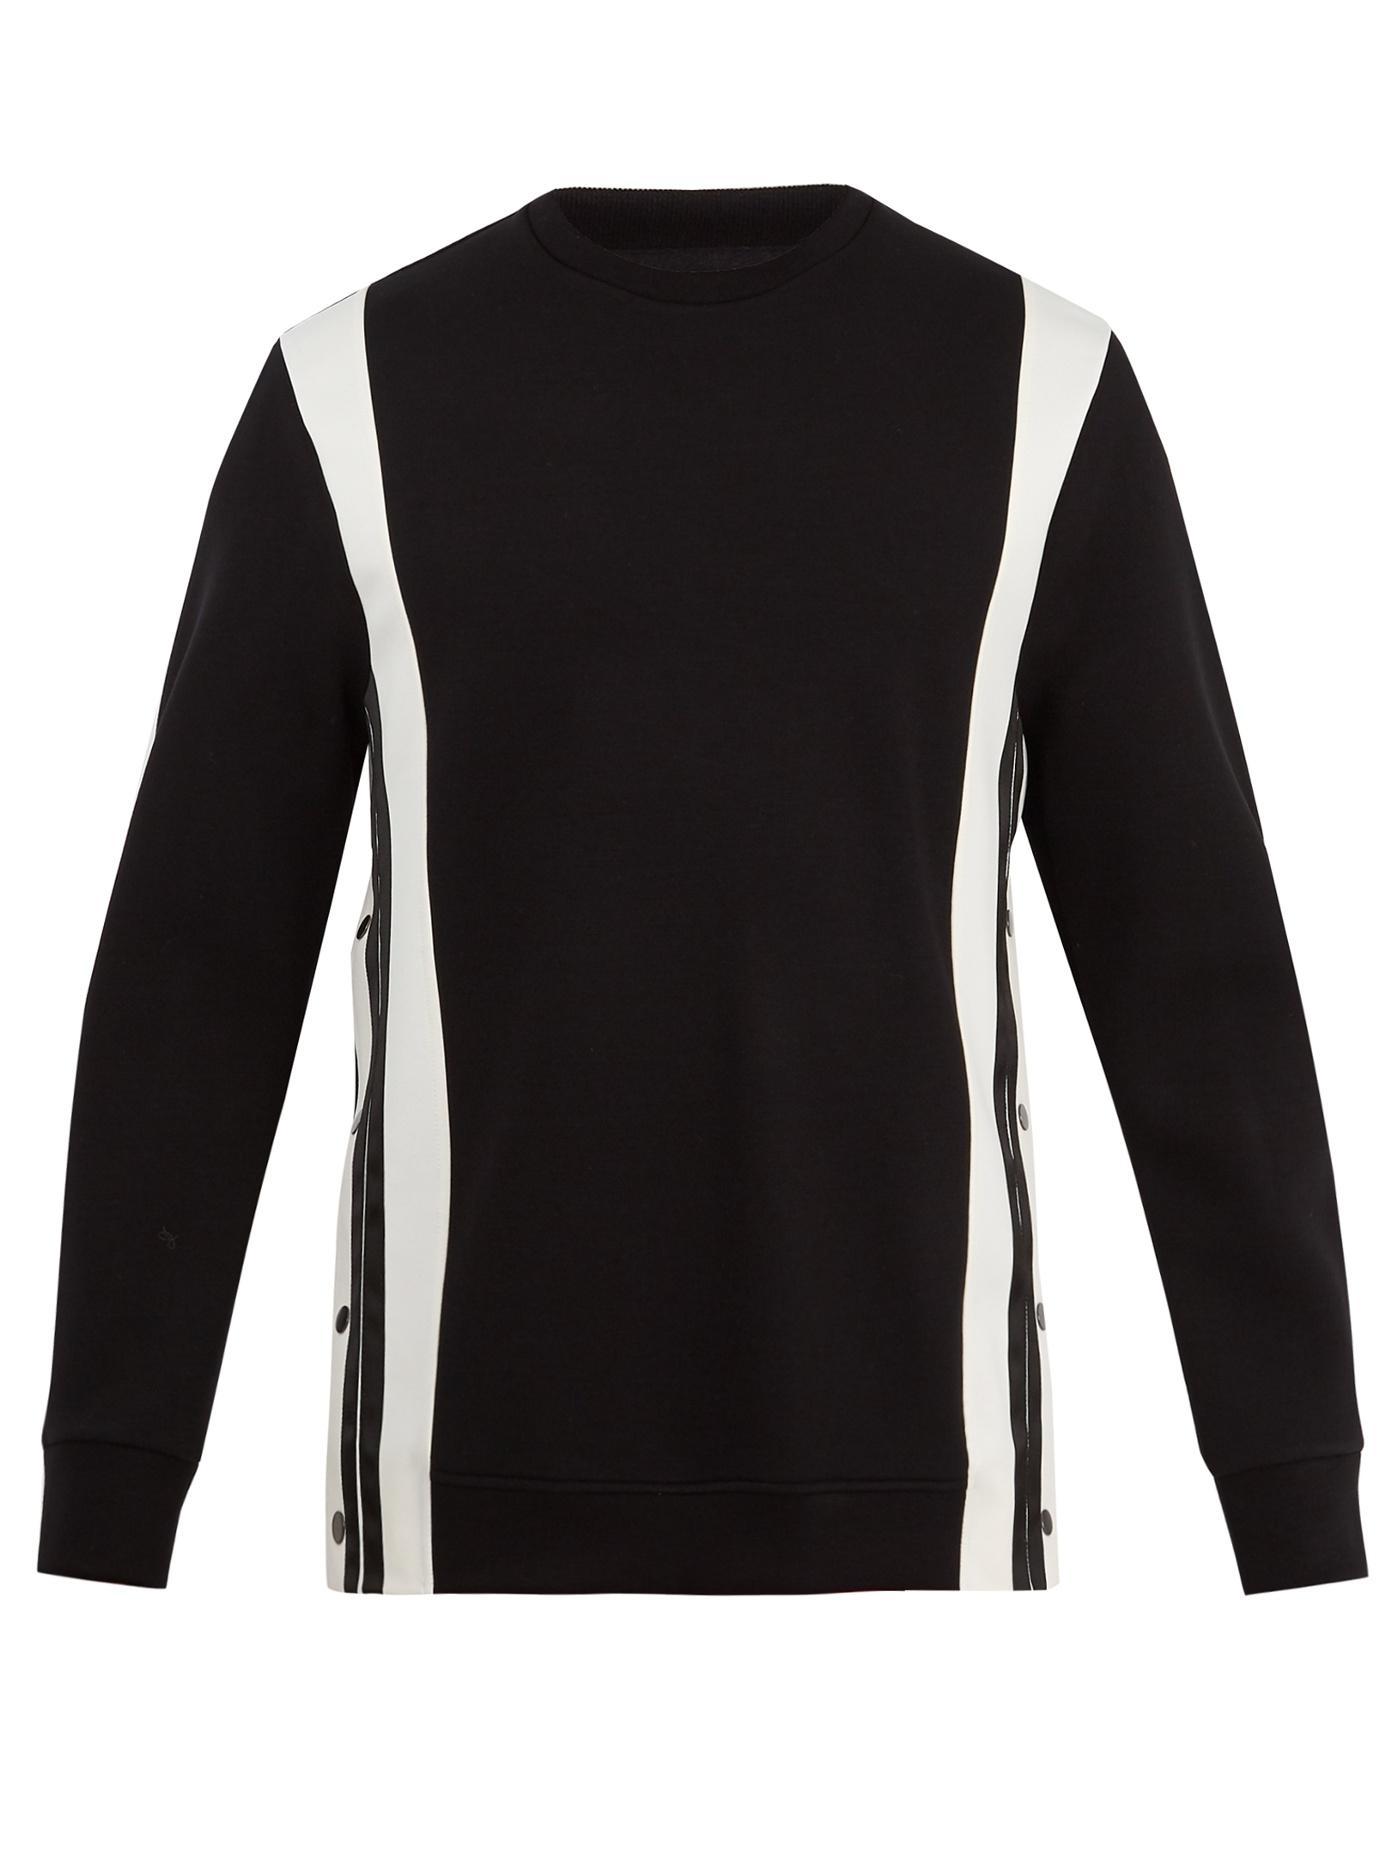 Neil Barrett Black & Off-White Side Snaps Sweatshirt In 042 Black/Off White